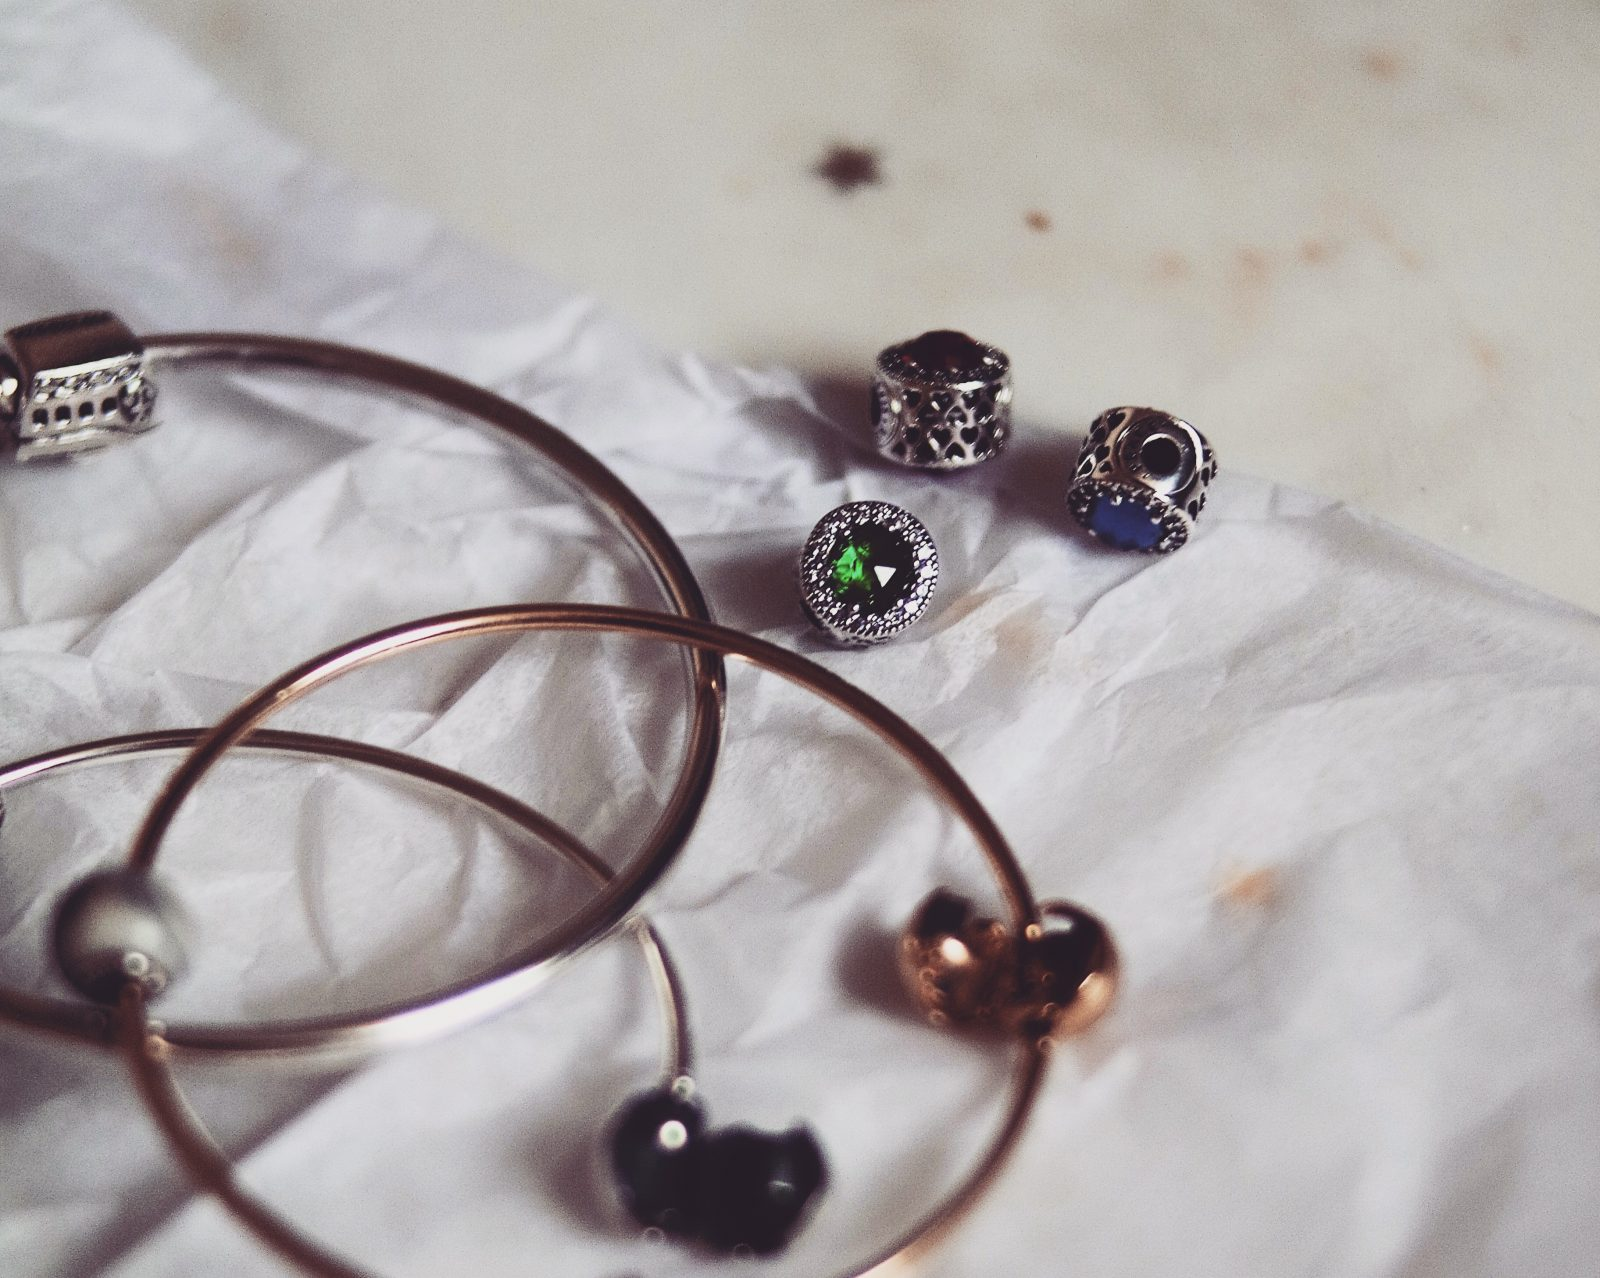 Gift guide for her - Pandora Christmas Charms